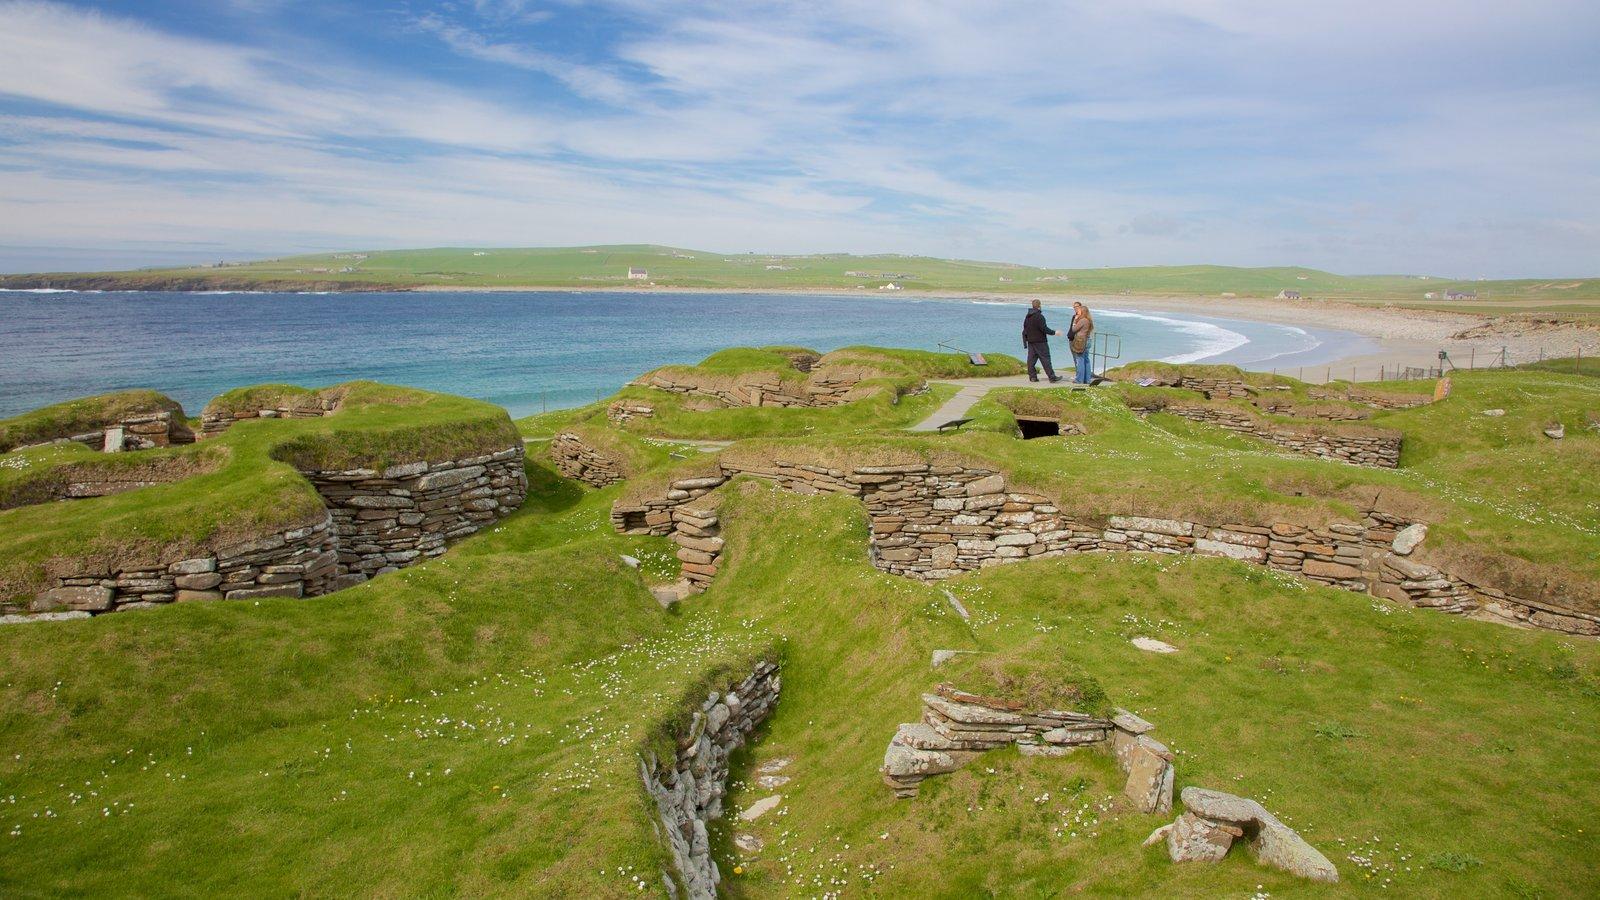 Skara Brae showing general coastal views, tranquil scenes and heritage elements